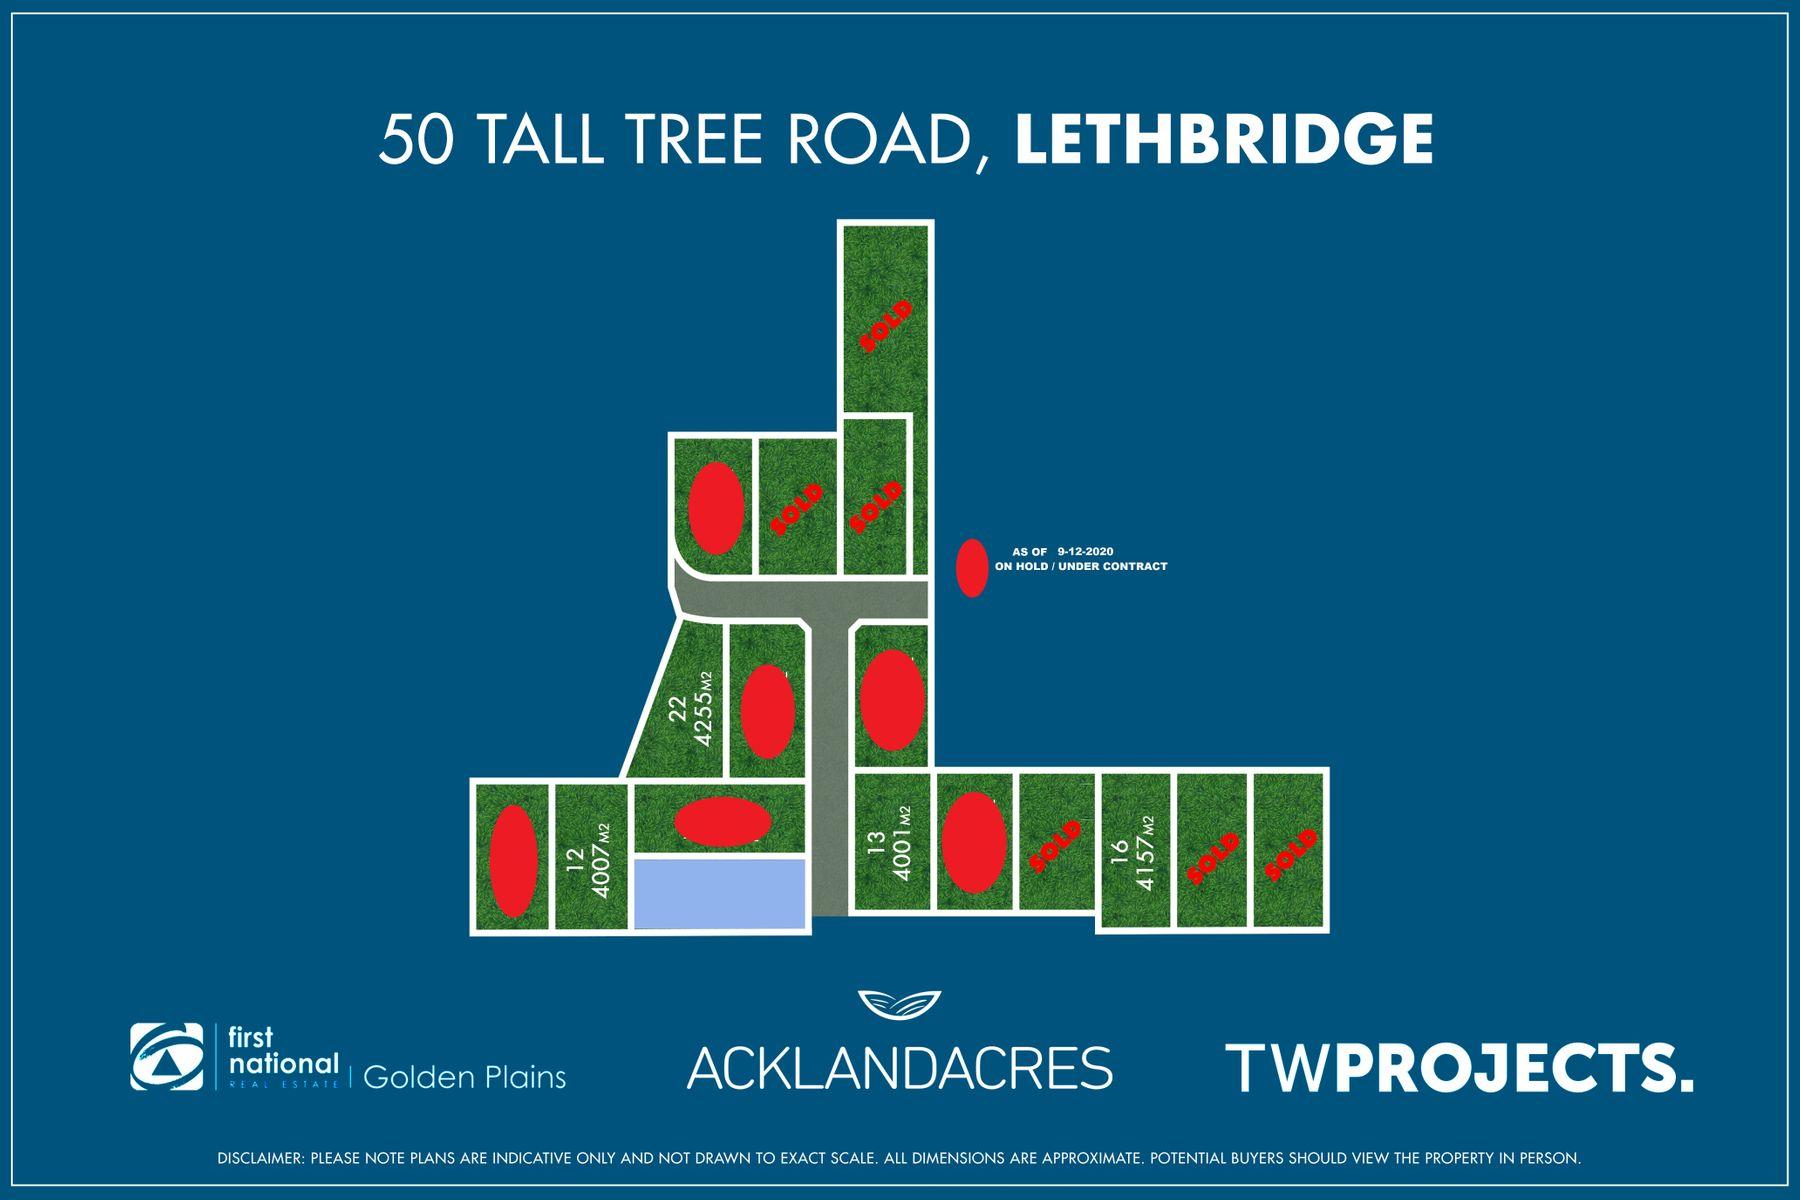 Lot 22, 50 Tall Tree Road, Lethbridge, VIC 3332